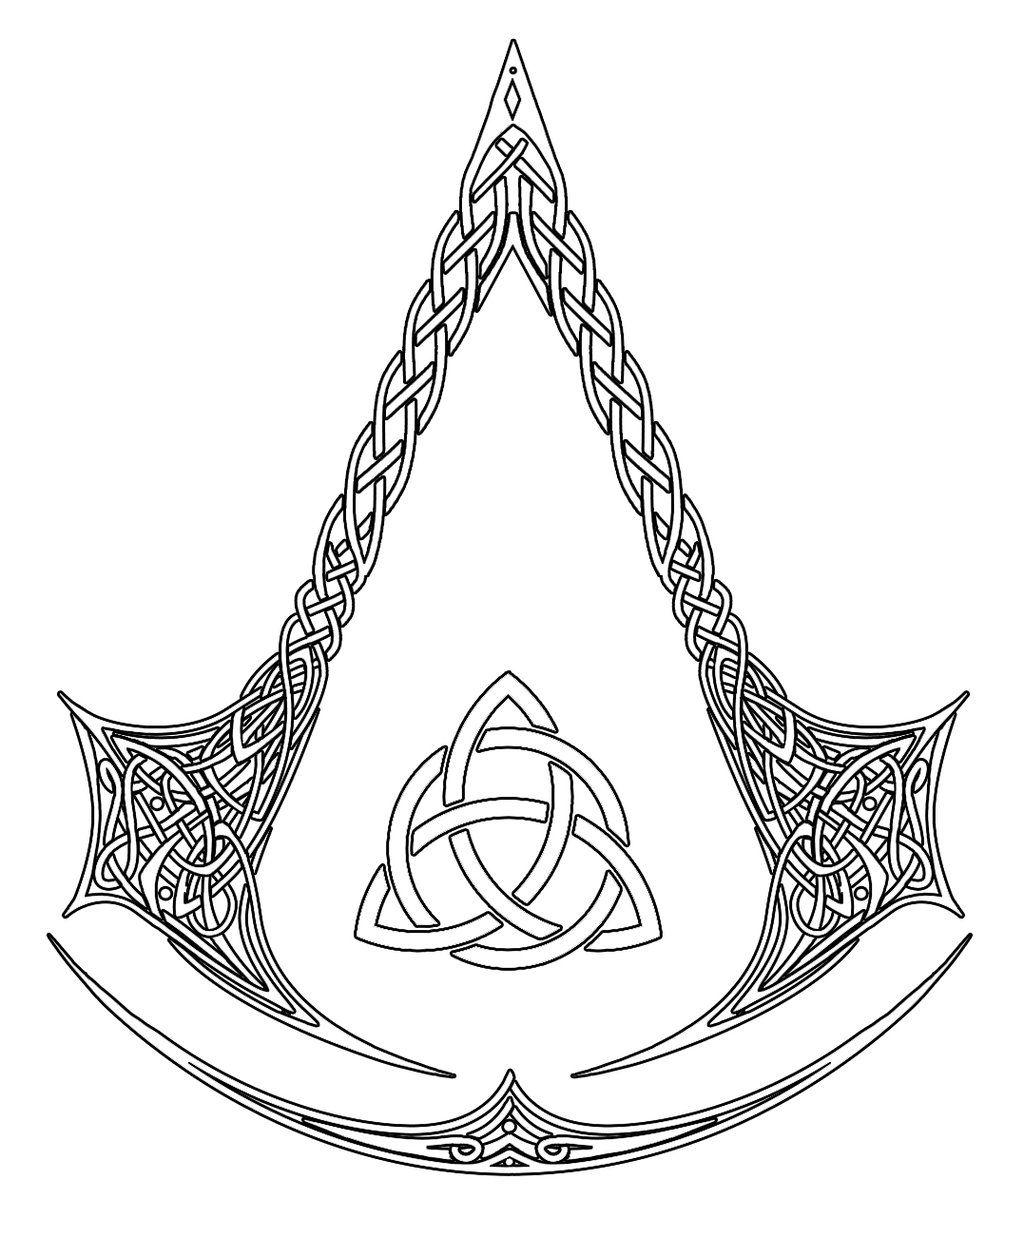 DeviantArt More Like Assassin's Creed Logo Tattoo